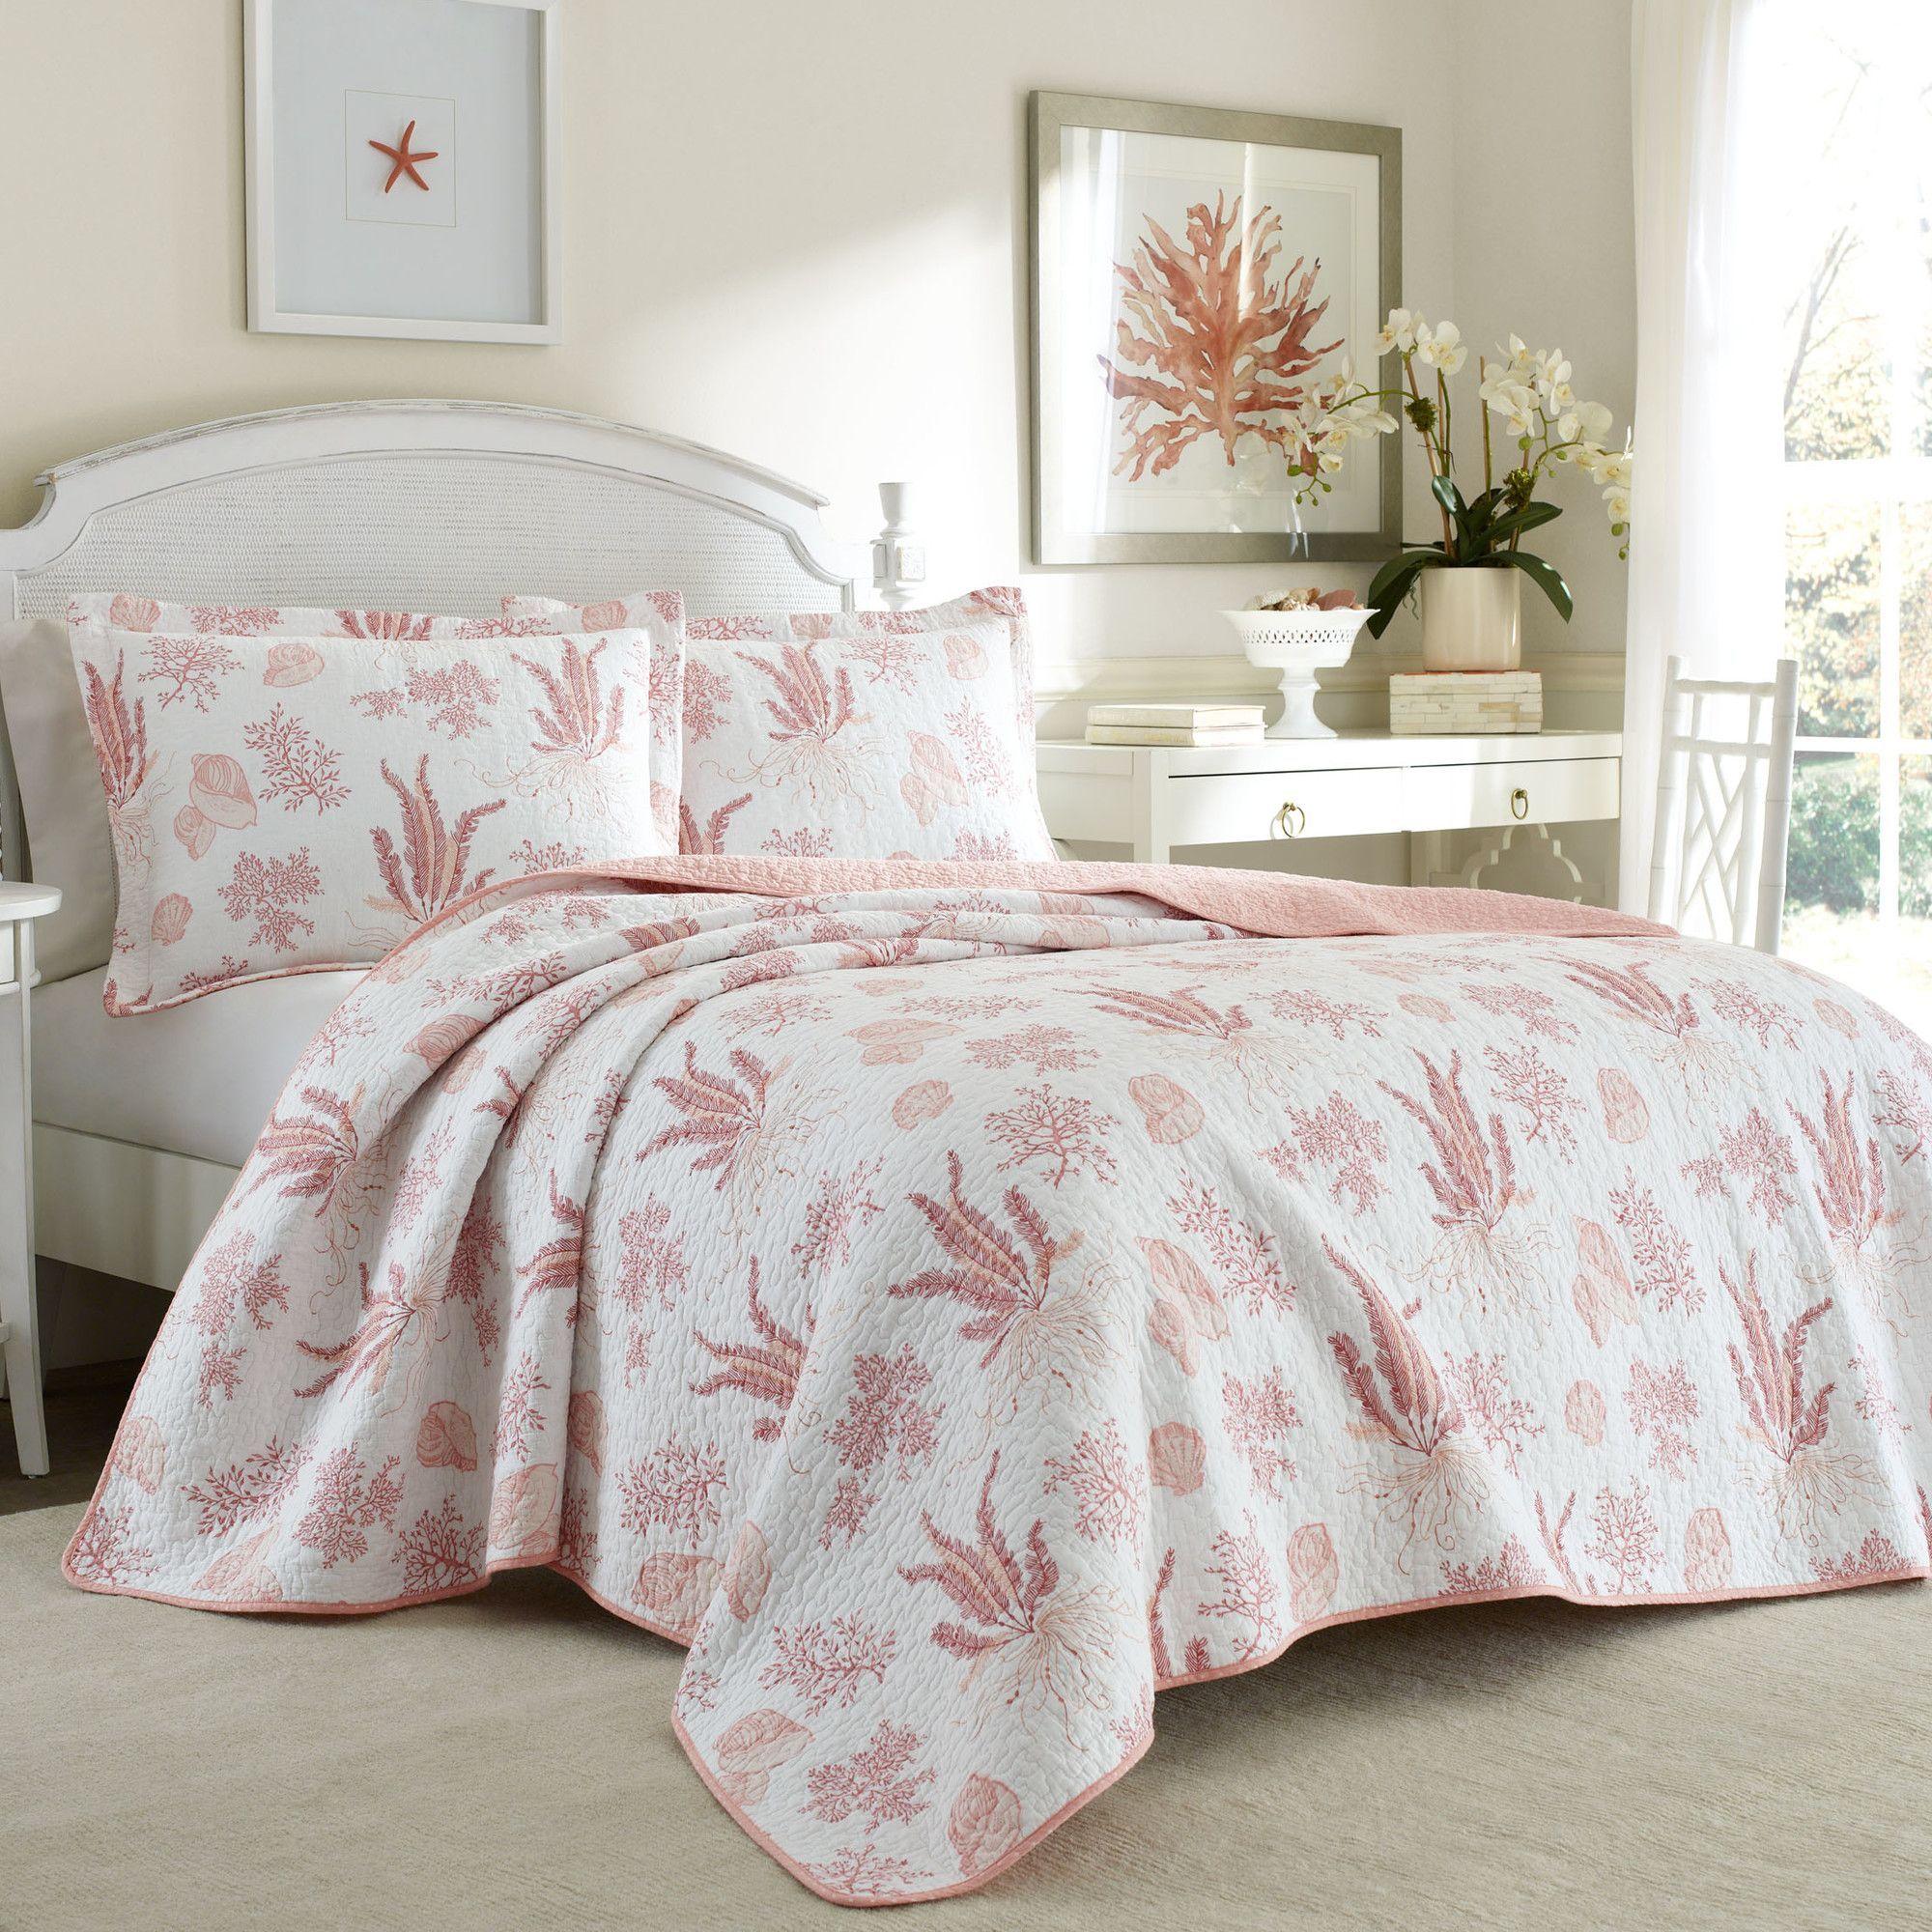 Cape Coral Quilt Set With Images Quilt Sets Bedding Sets